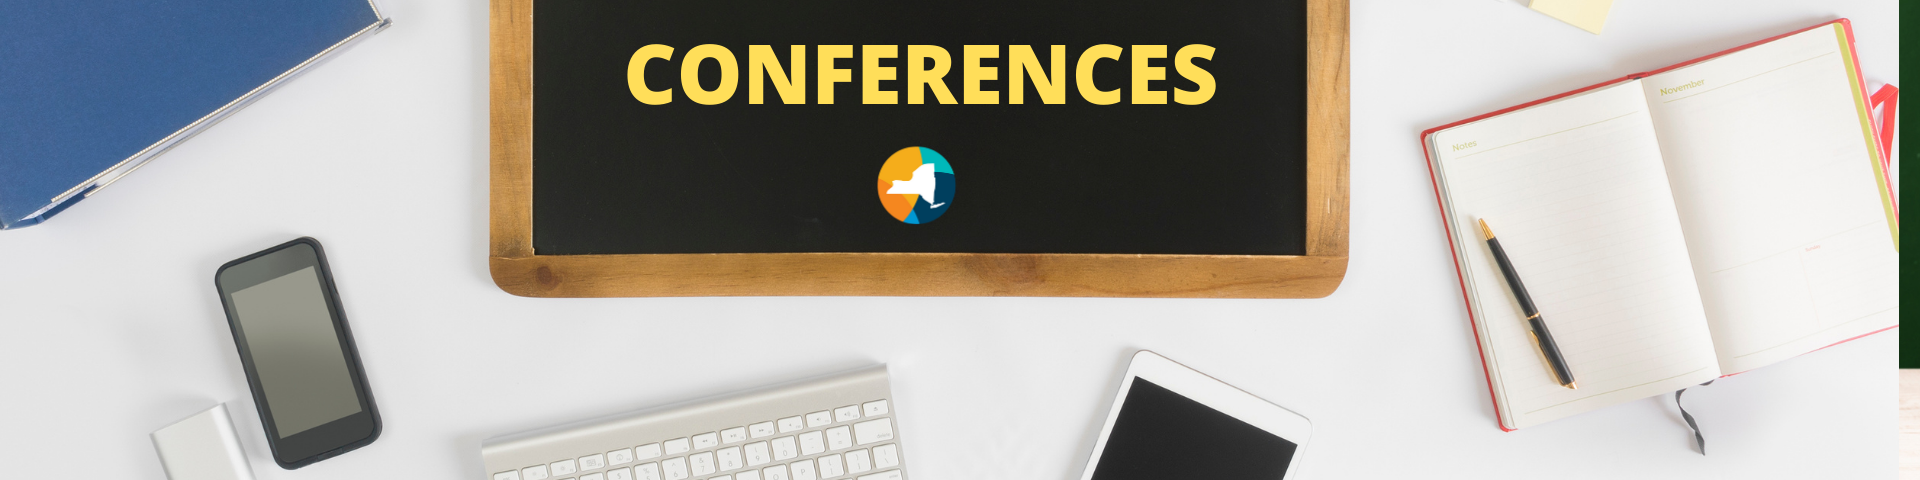 Conferences banner